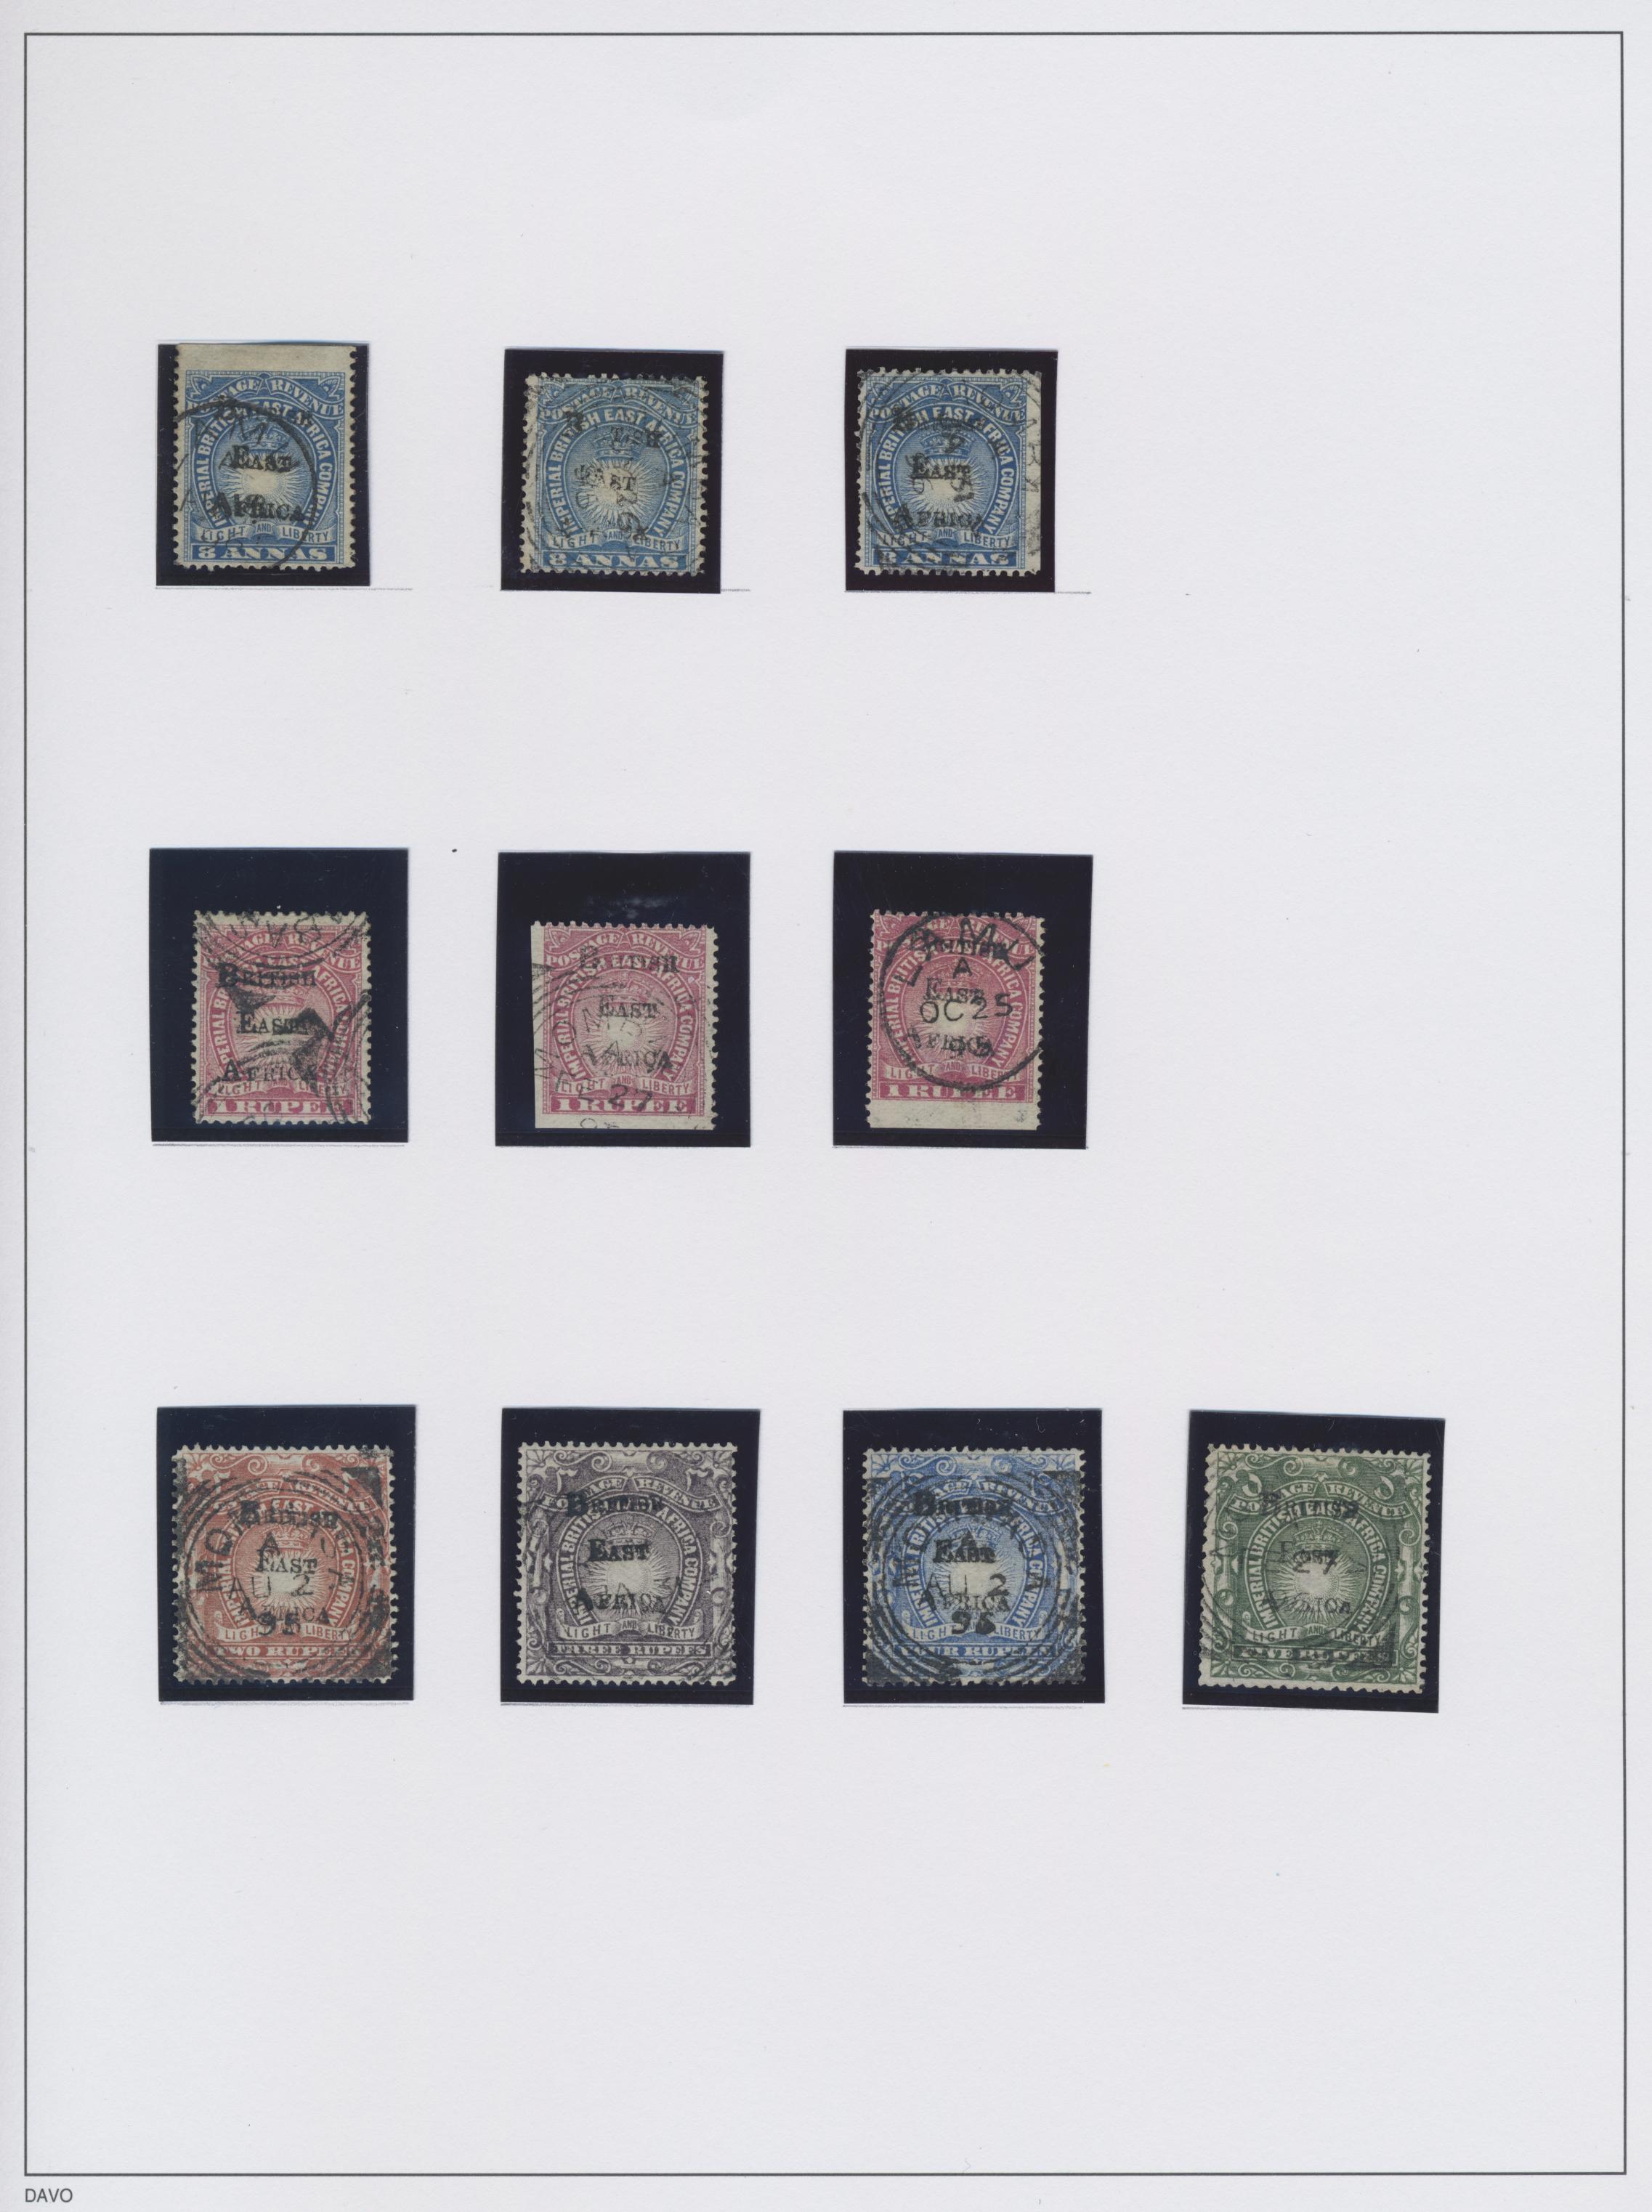 Lot 13024 - britisch-ostafrika und uganda  -  Auktionshaus Christoph Gärtner GmbH & Co. KG Sale #48 collections Overseas  Airmail / Ship mail & Thematics